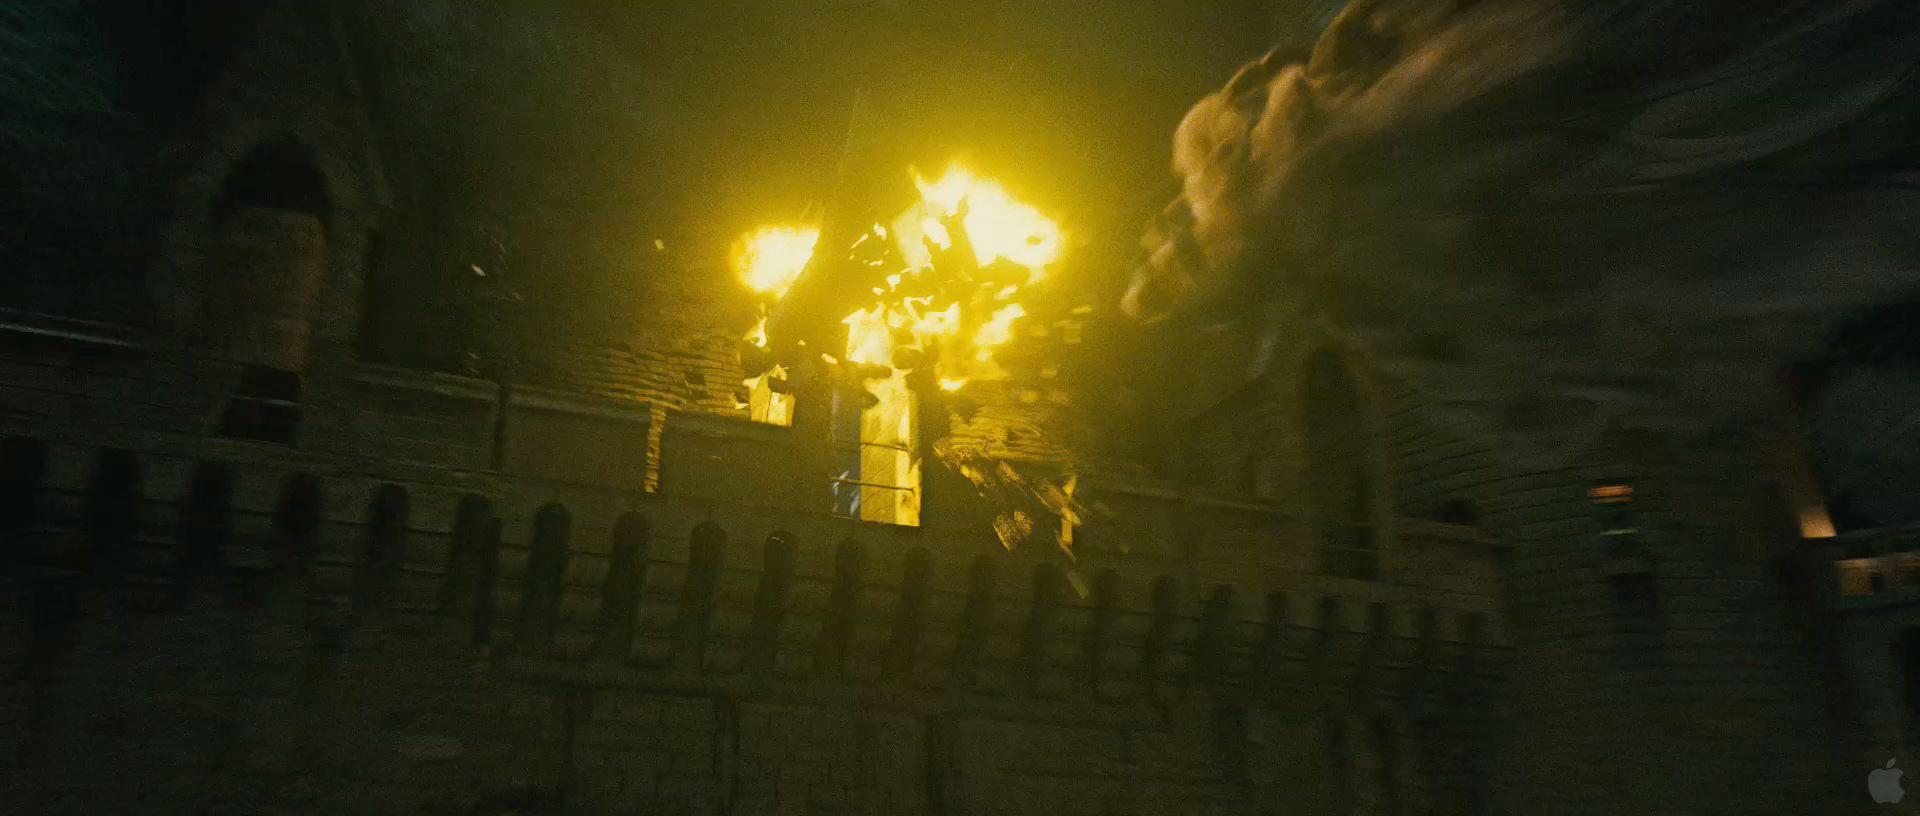 Harry Potter BlogHogwarts HP7 2 Trailer 35